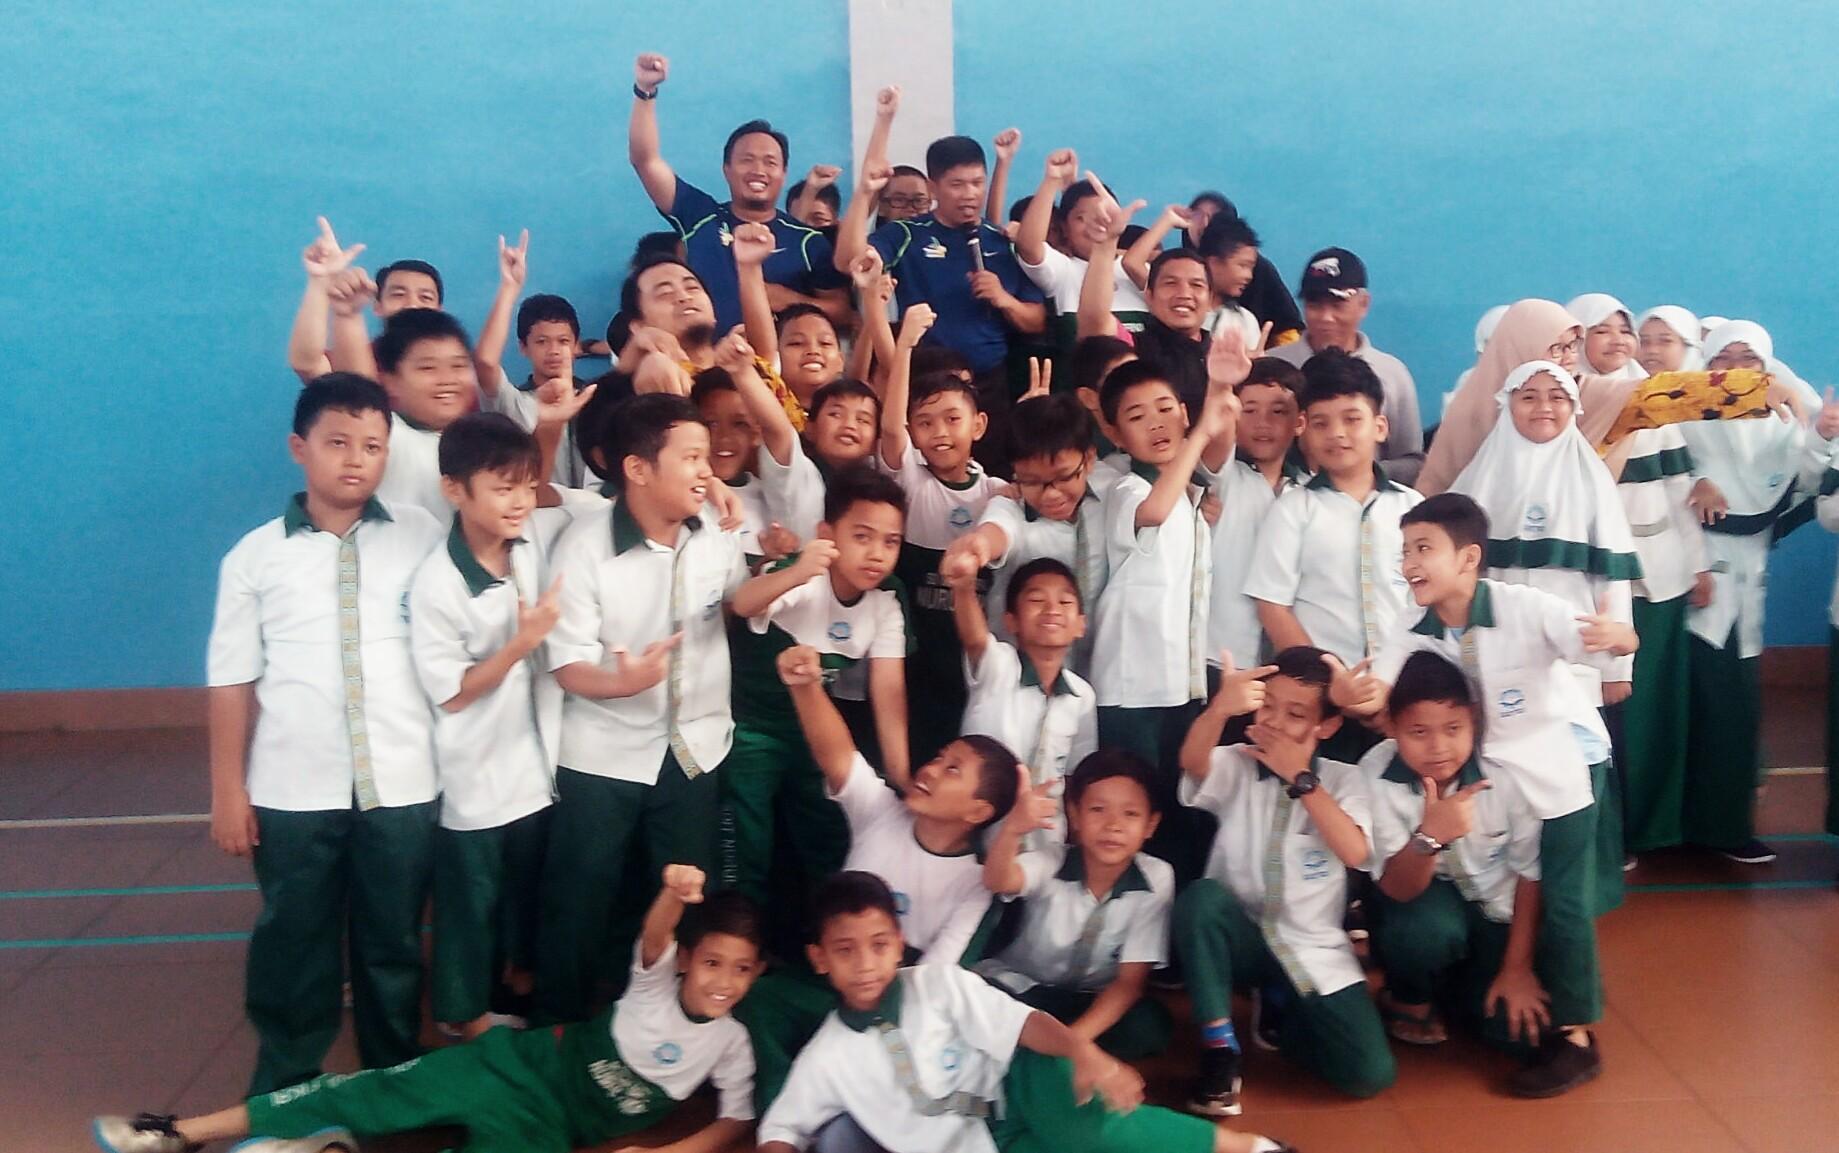 TIM Senam KIT Berfoto bersama usai melakukan Senam bersama di Aula gedung olahraga SDIT Nurul Fikri